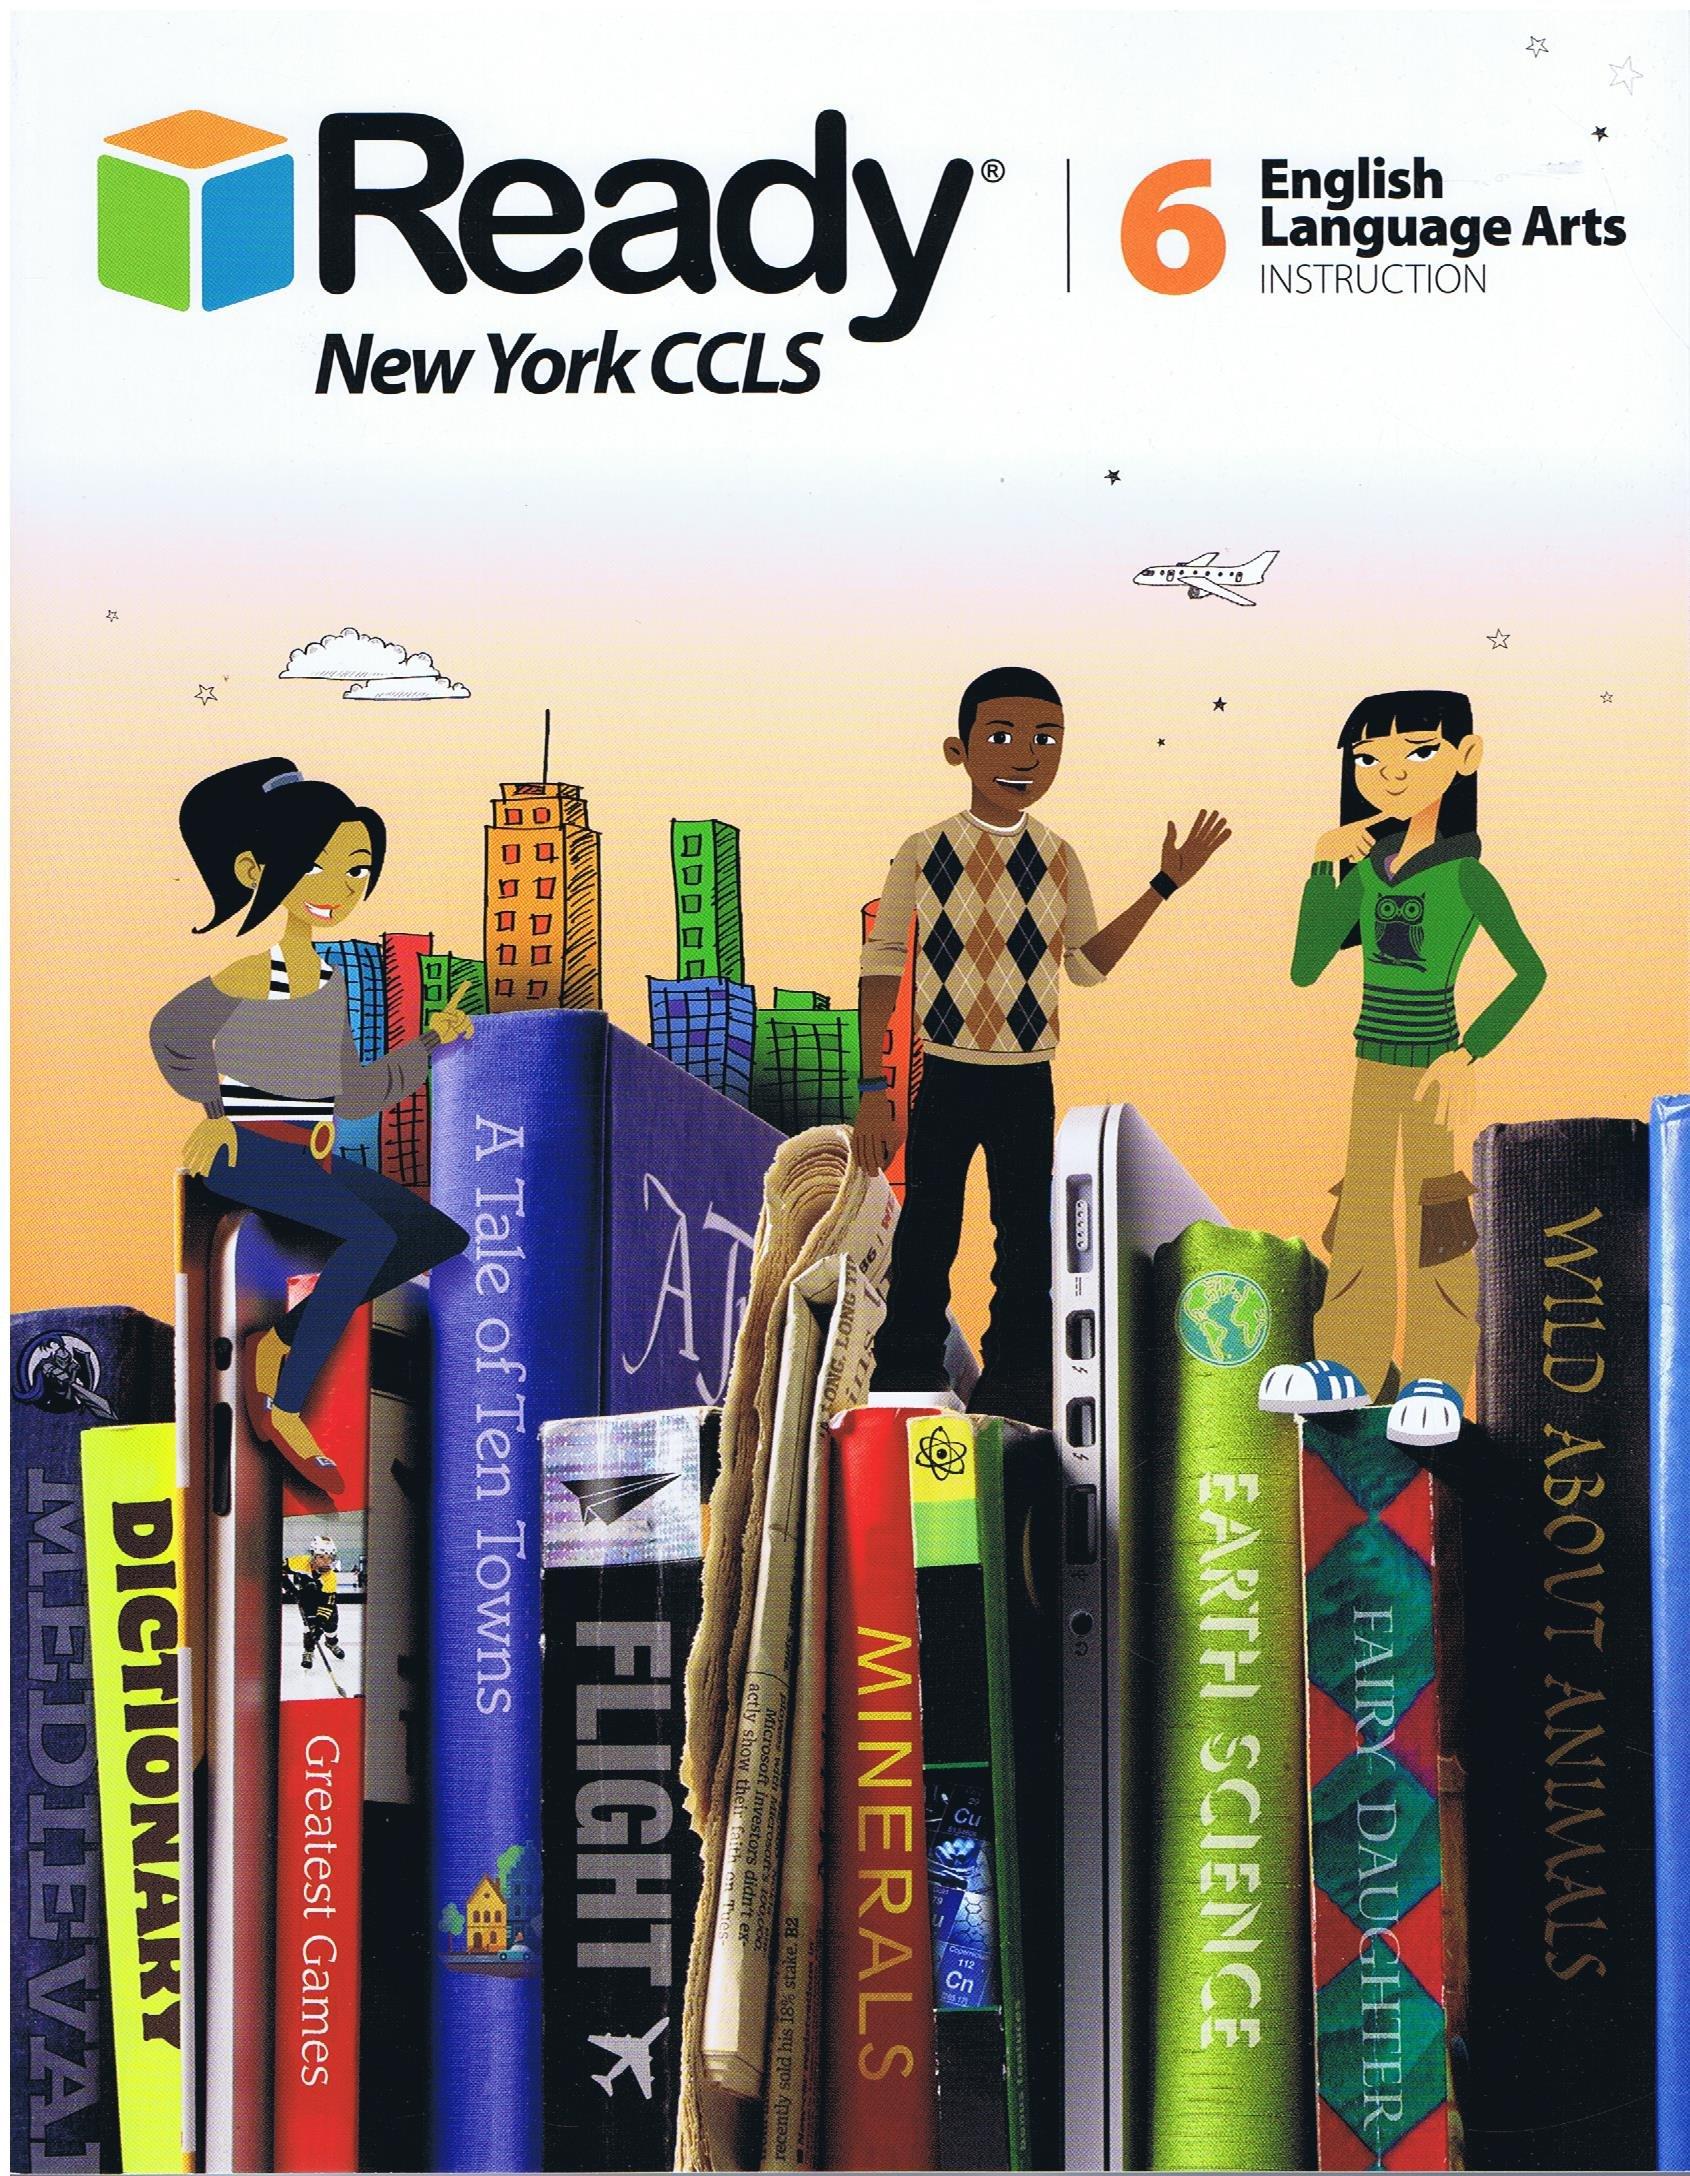 Amazon.com: 2014 Ready New York CCLS Common Core ELA Instruction Grade 6 ( Ready) (9780760983935): Books